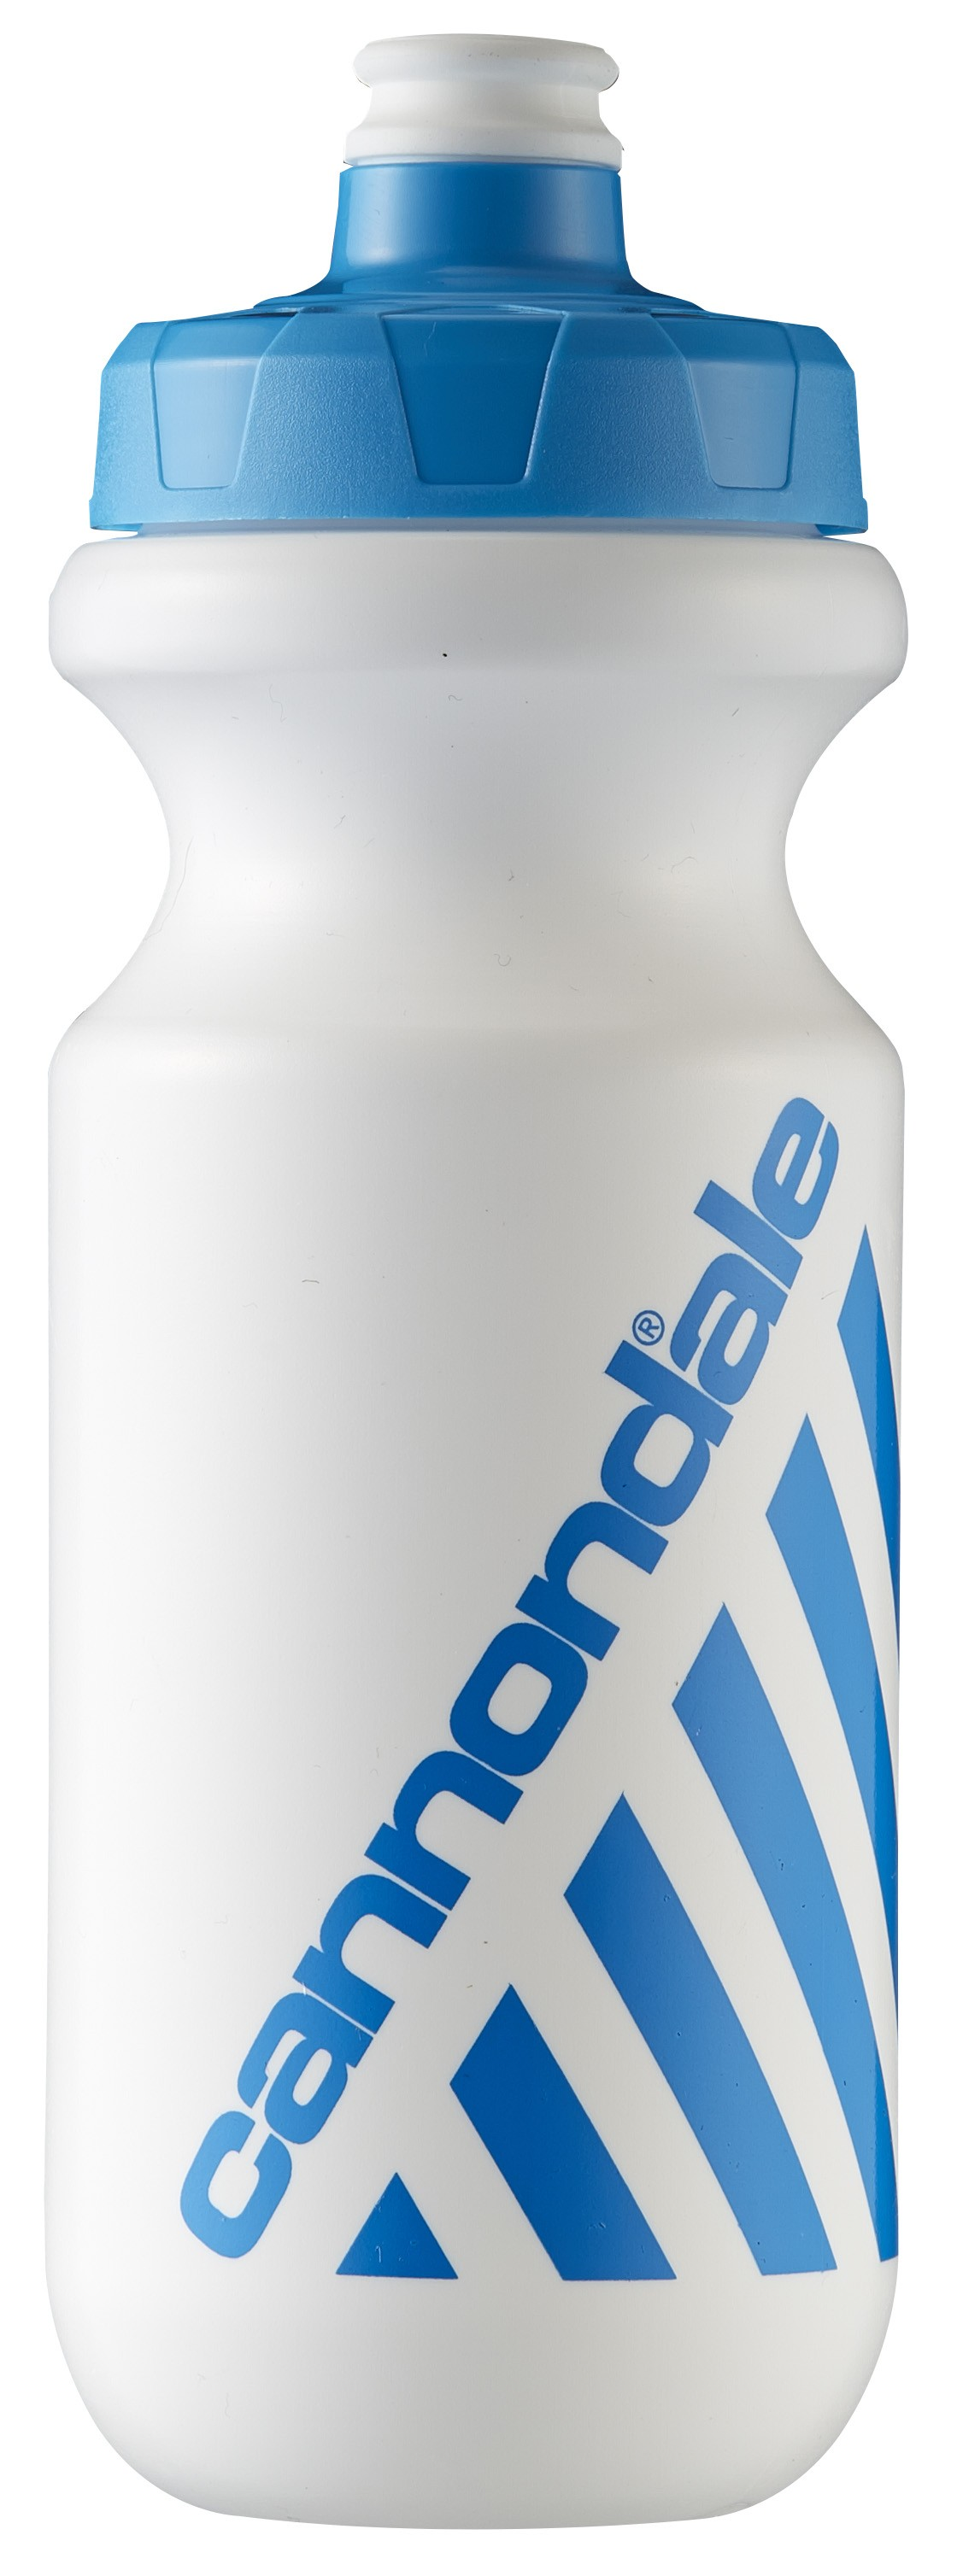 Cannondale Water Bottle Retro Logo White/Blue 20 oz CU41512003